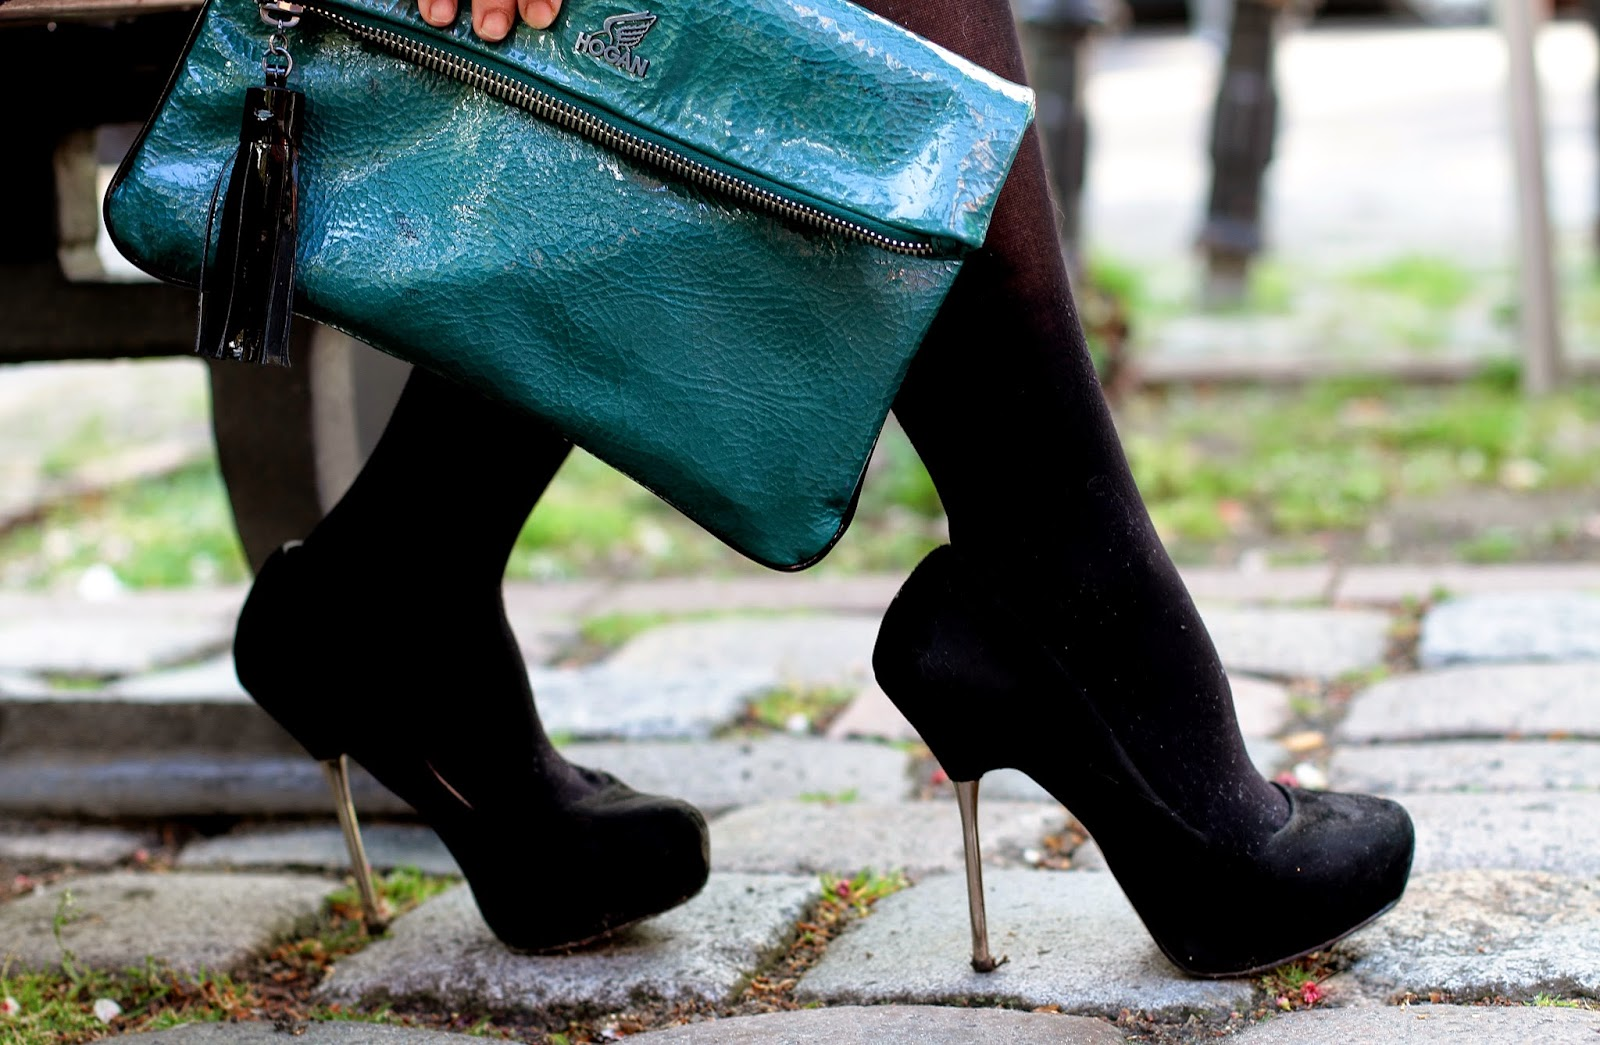 chicetoile_francesca_castellano_shoes_high_heels_zara_details